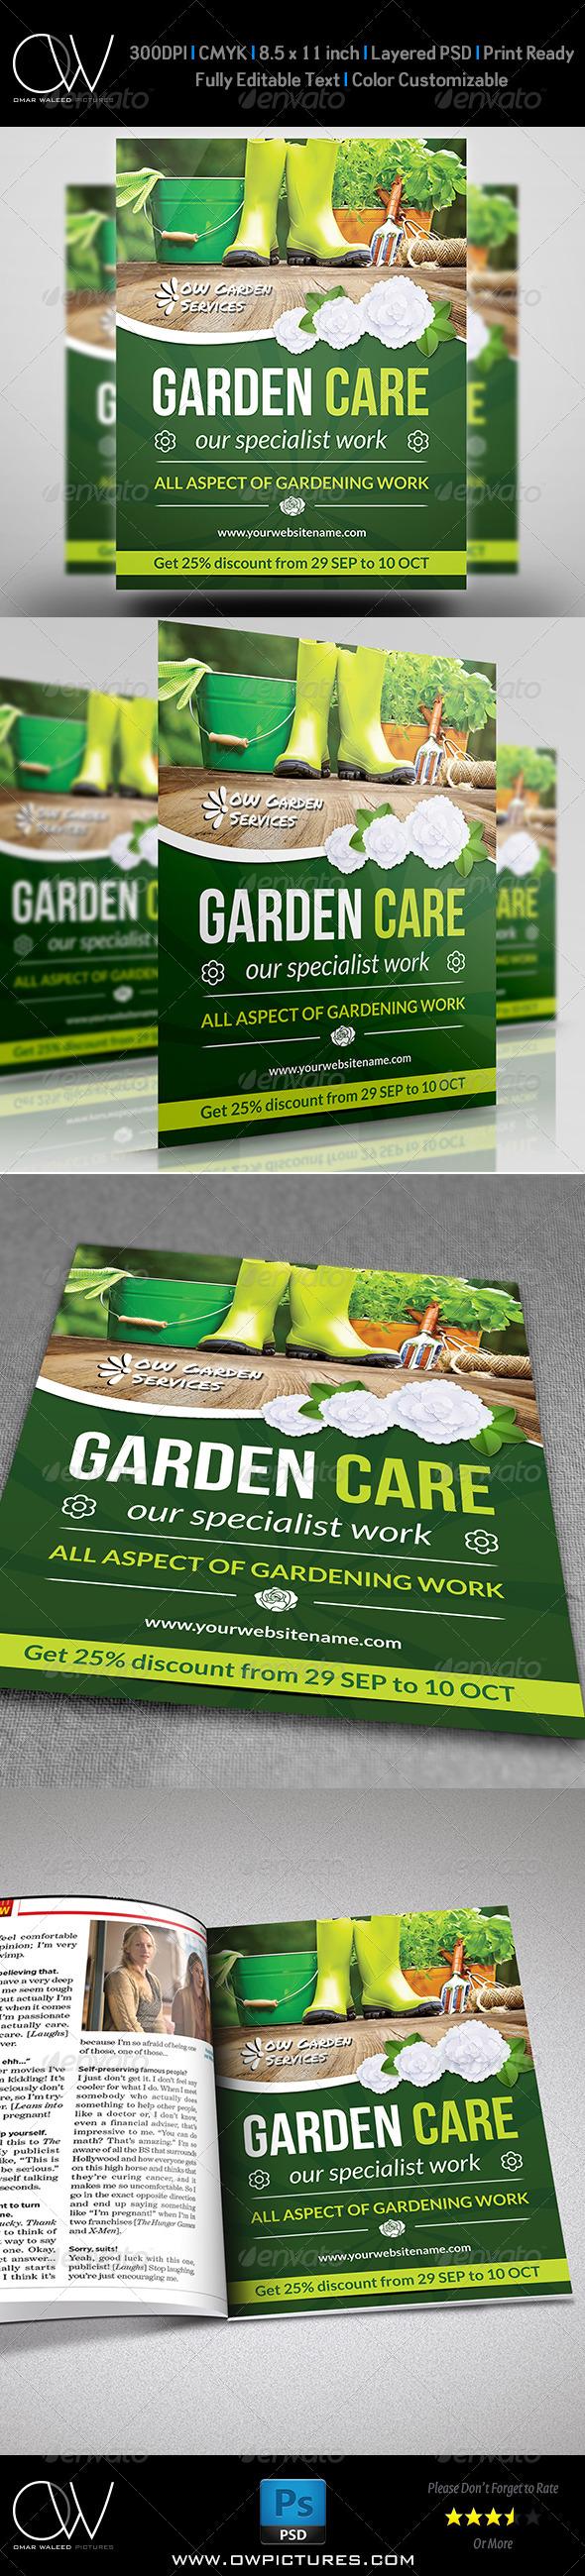 GraphicRiver Garden Services Flyer Vol.2 7814022